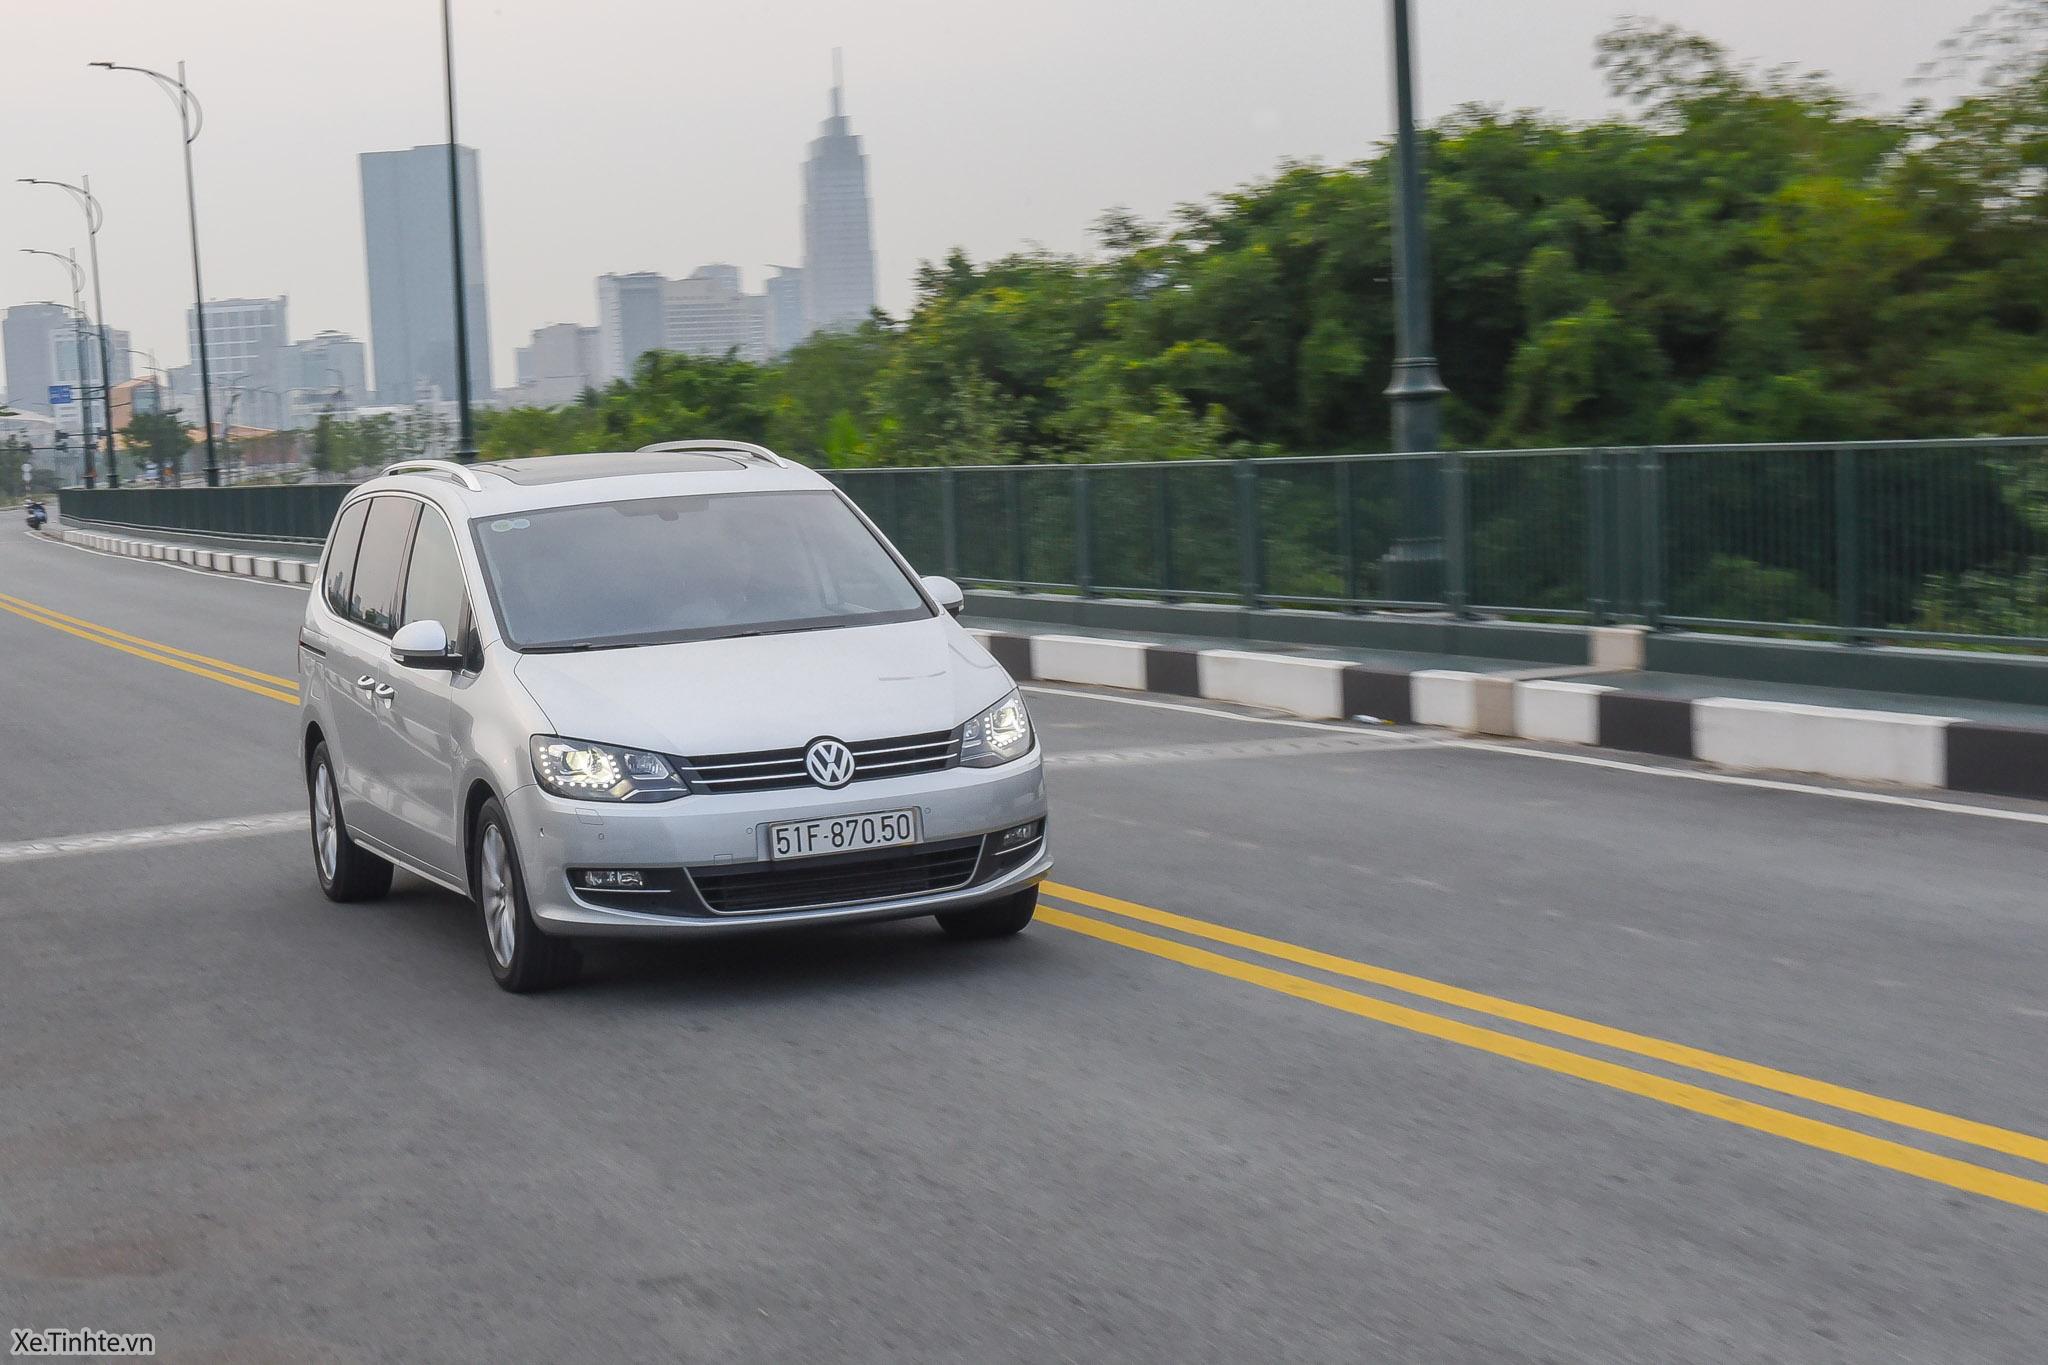 Volkswagen_Sharan_Xe_Tinhte_123.jpg